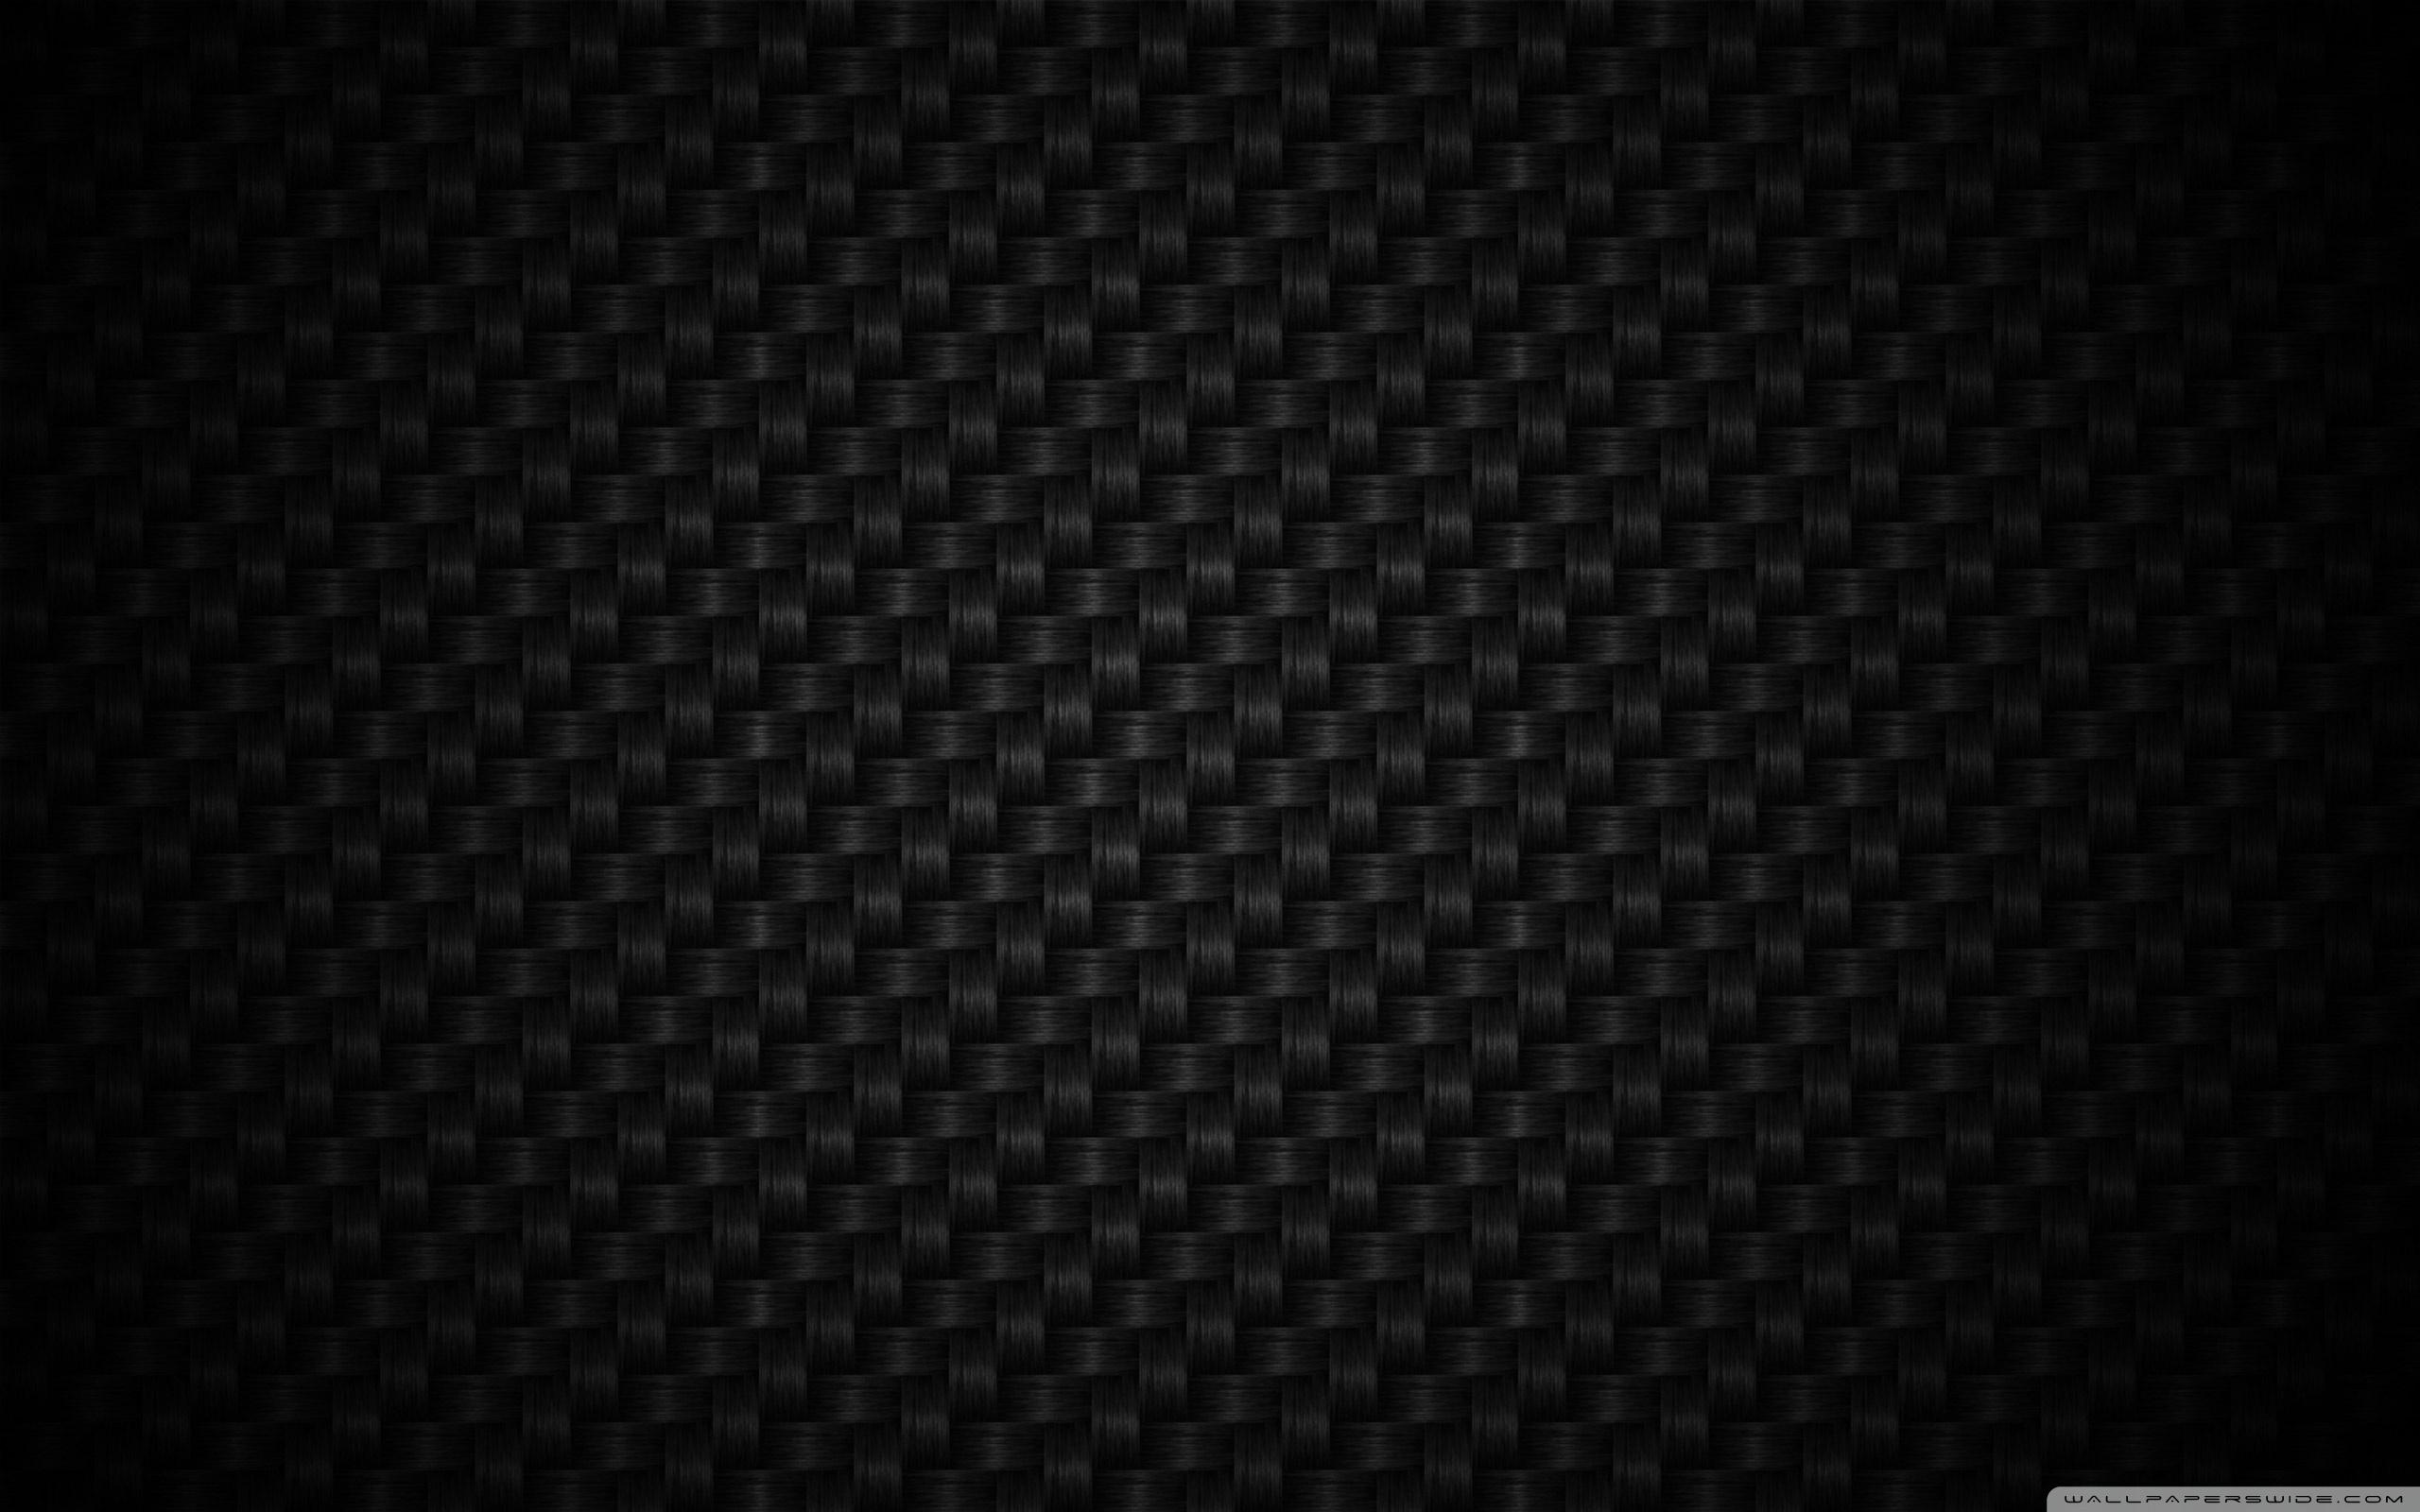 Mito Ou Verdade Wallpaper Escuro Ajuda A Economizar Bateria